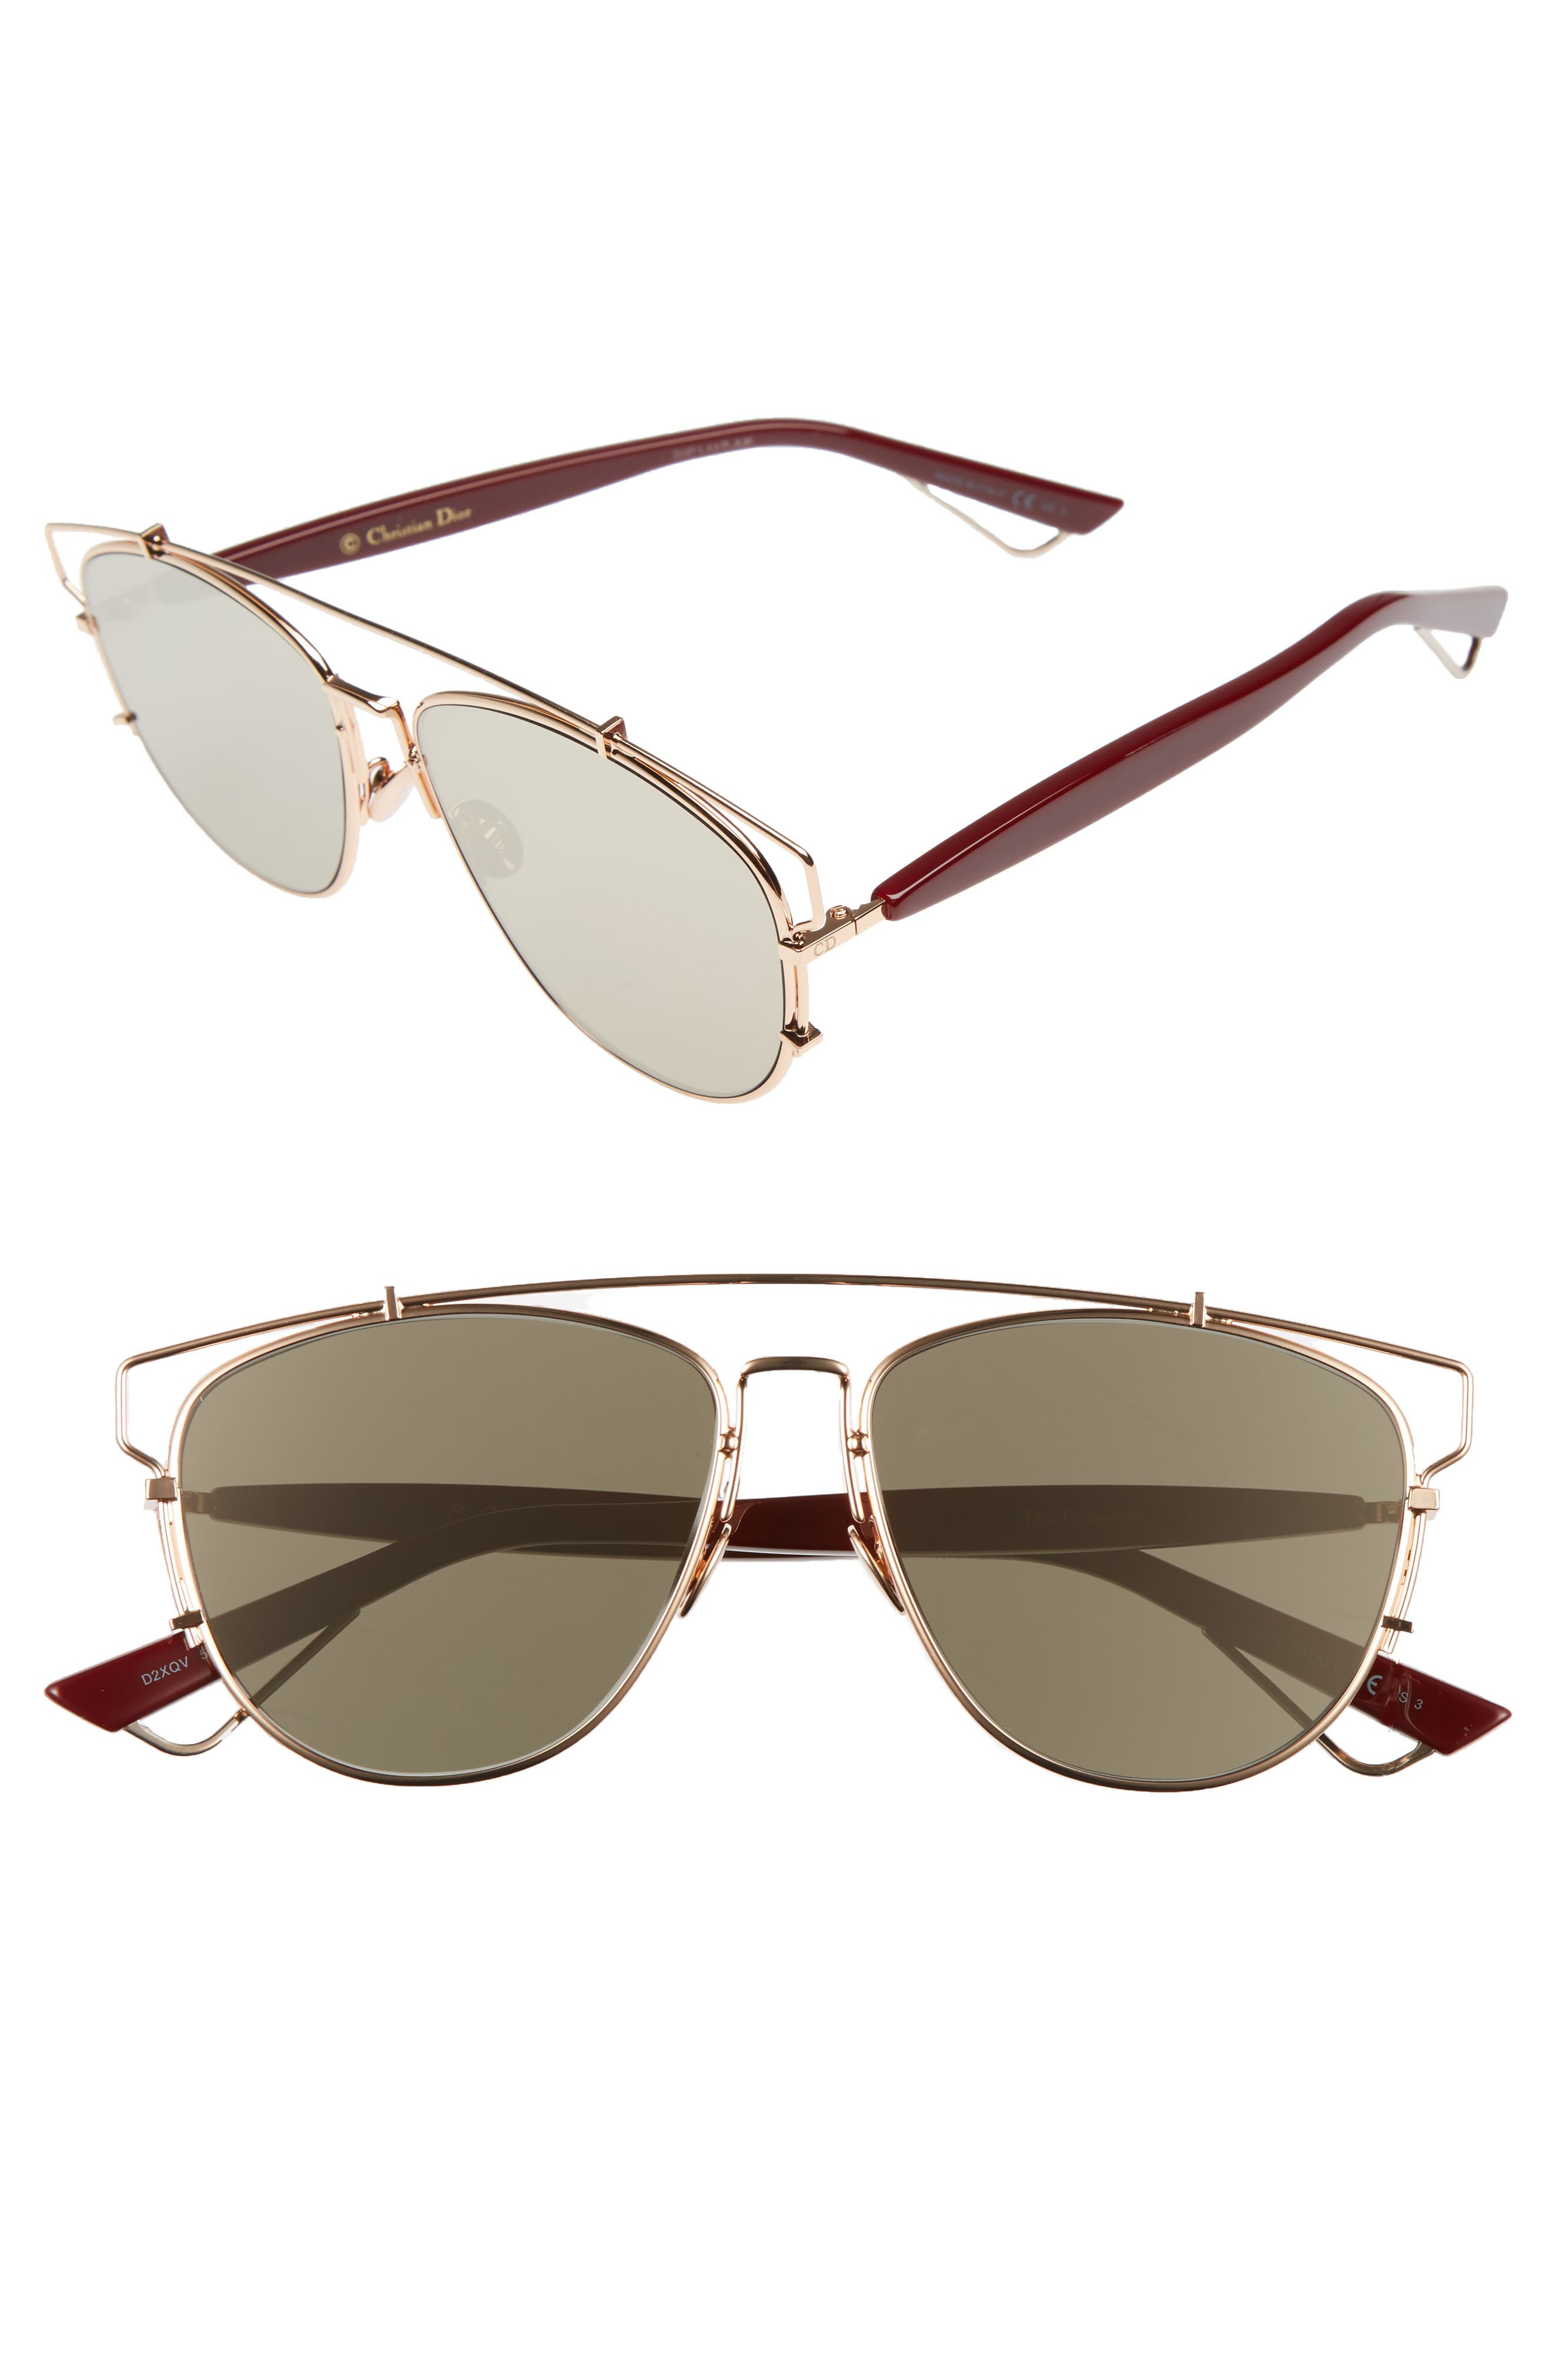 Technologic 57mm Brow Bar Sunglasses,                         Main,                         color, Gold Copper/ Blue